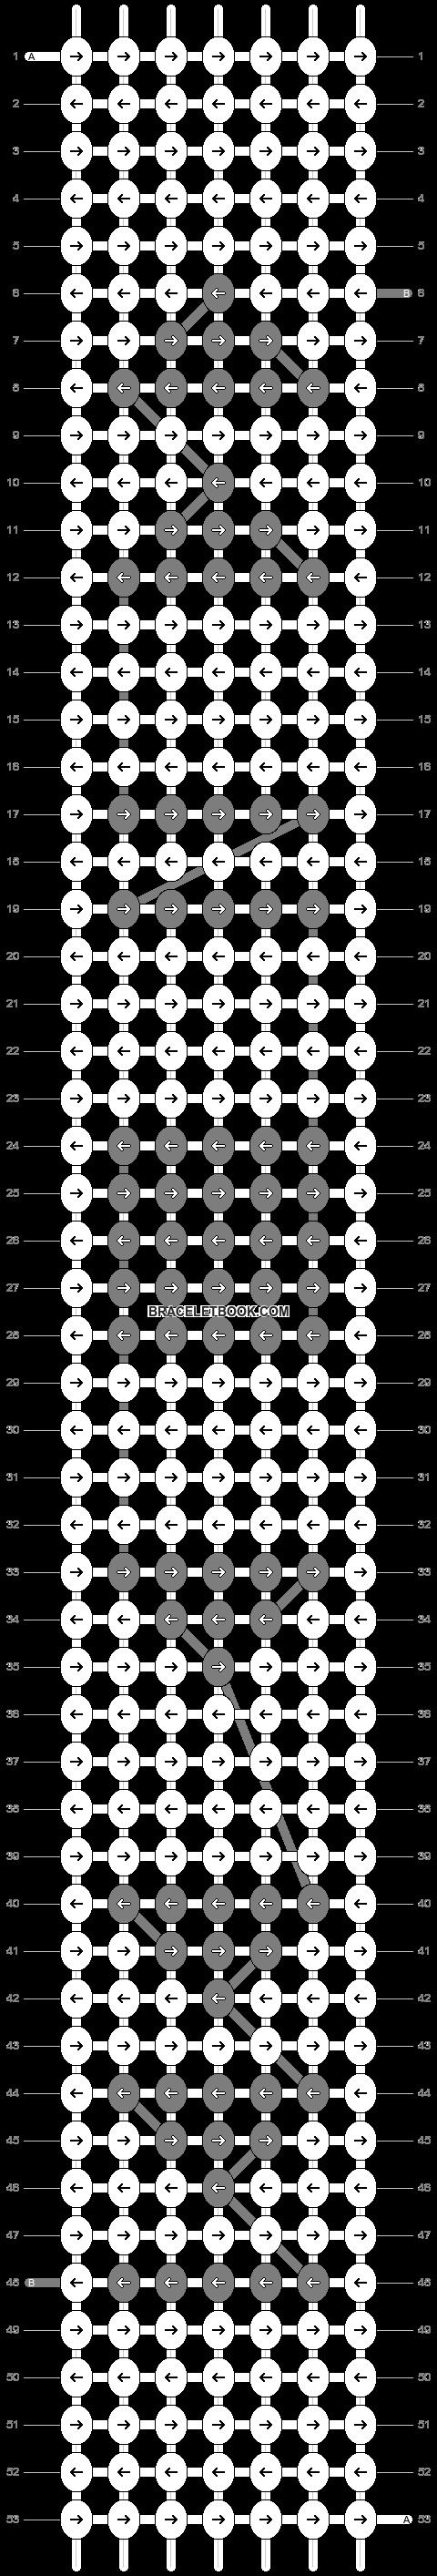 Alpha pattern #21973 pattern